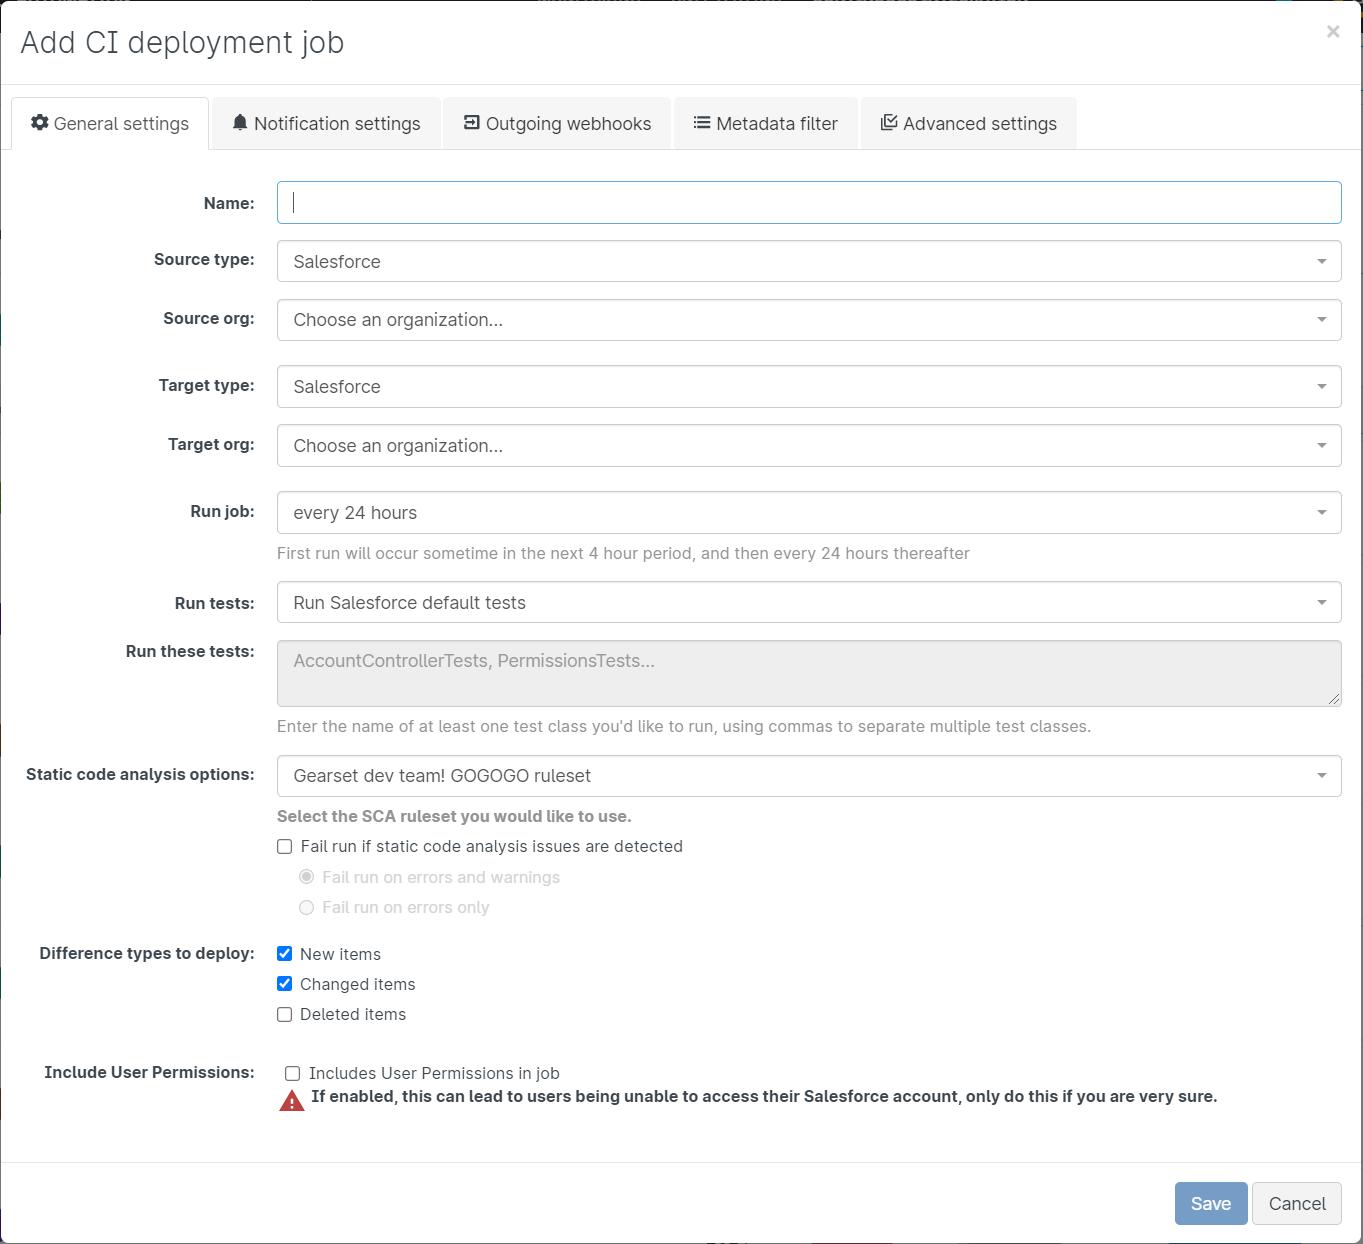 CI deployment job pop-up window that allows users to configure their CI deployment job.